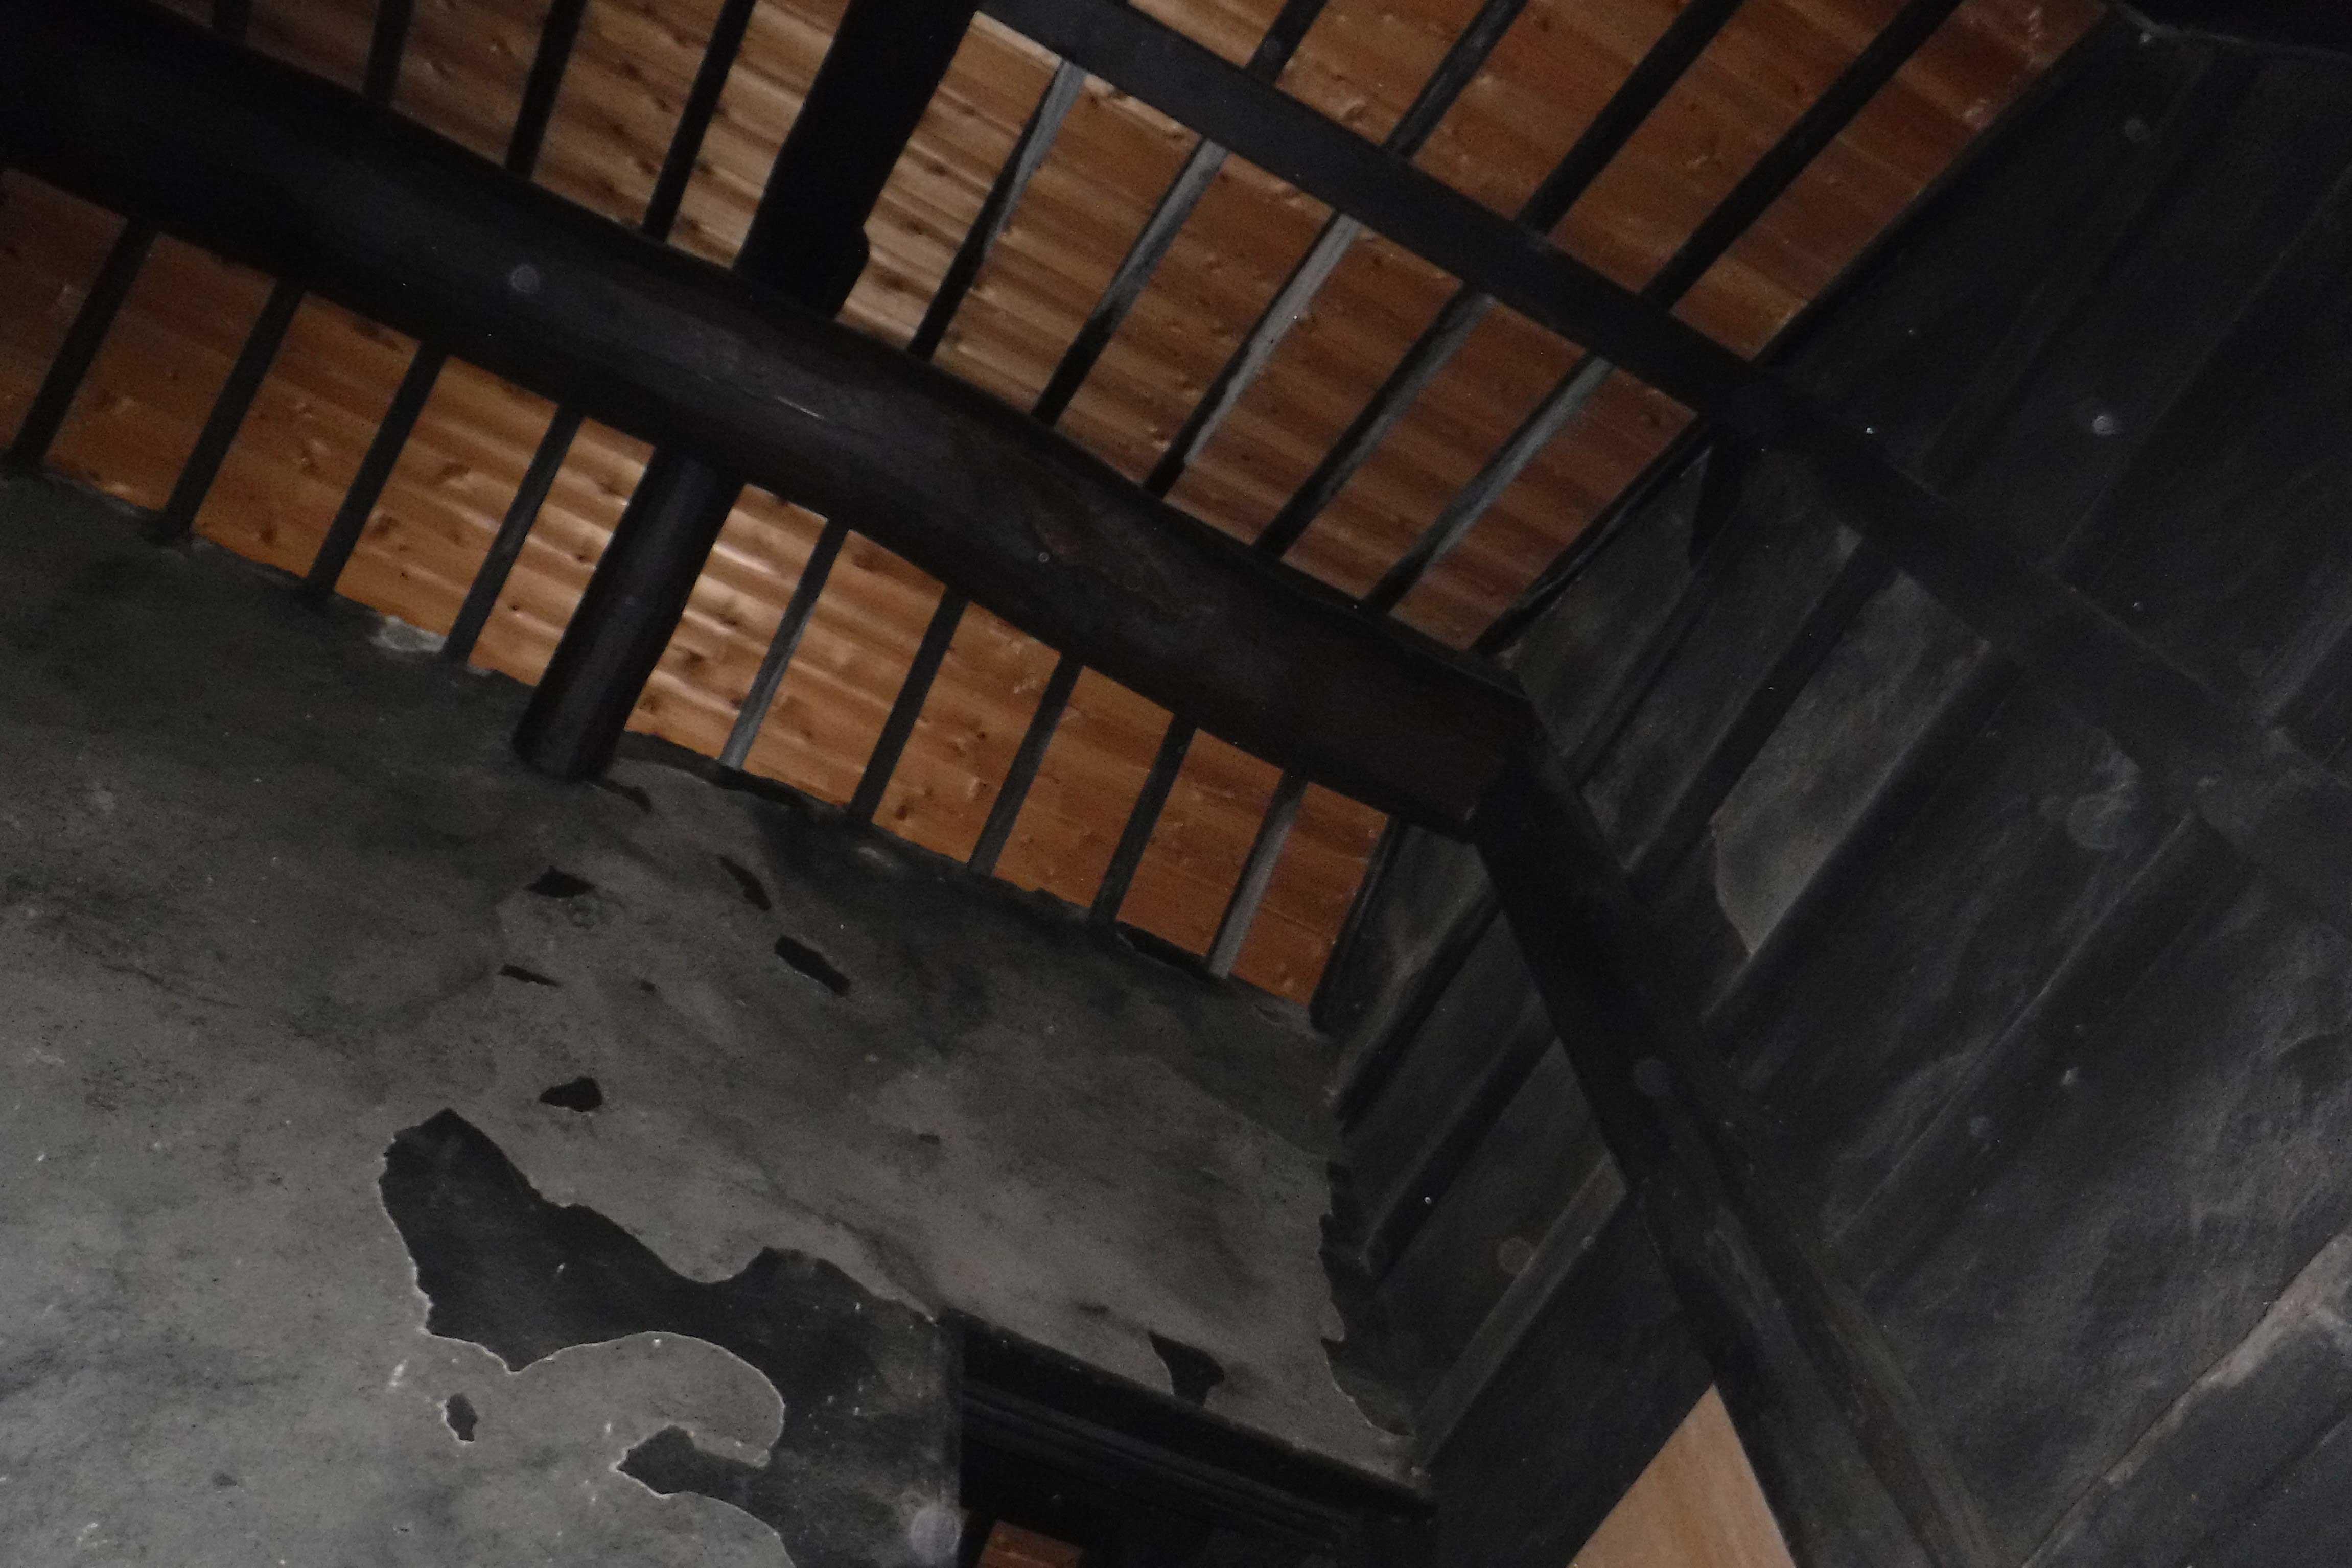 <p>主屋 梁柱主結構,屋頂結構構架</p>屋頂翻造為桟瓦頂時的瓦下木板。